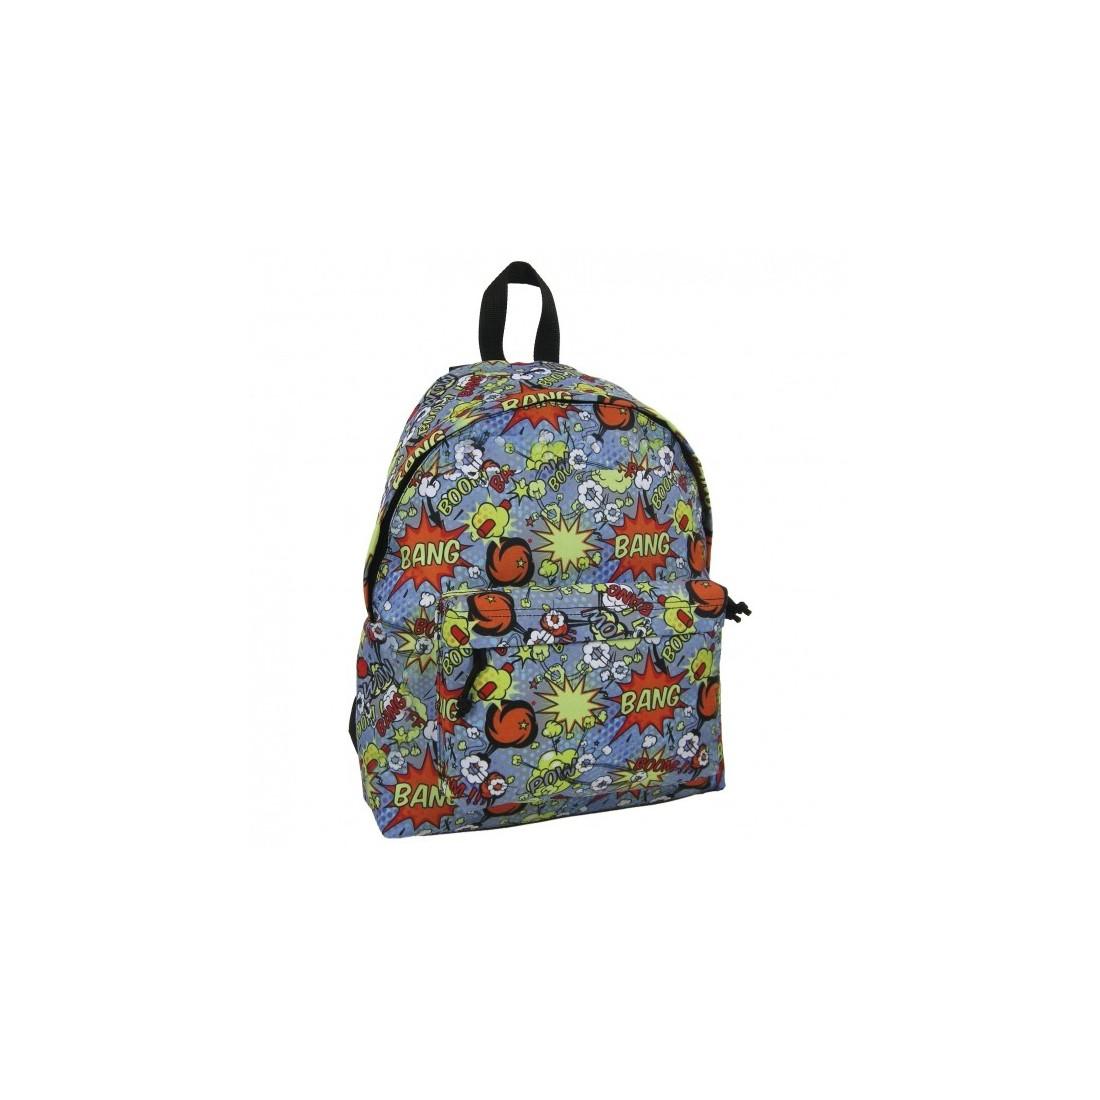 Plecak młodzieżowy Fullprint Bang - plecak-tornister.pl